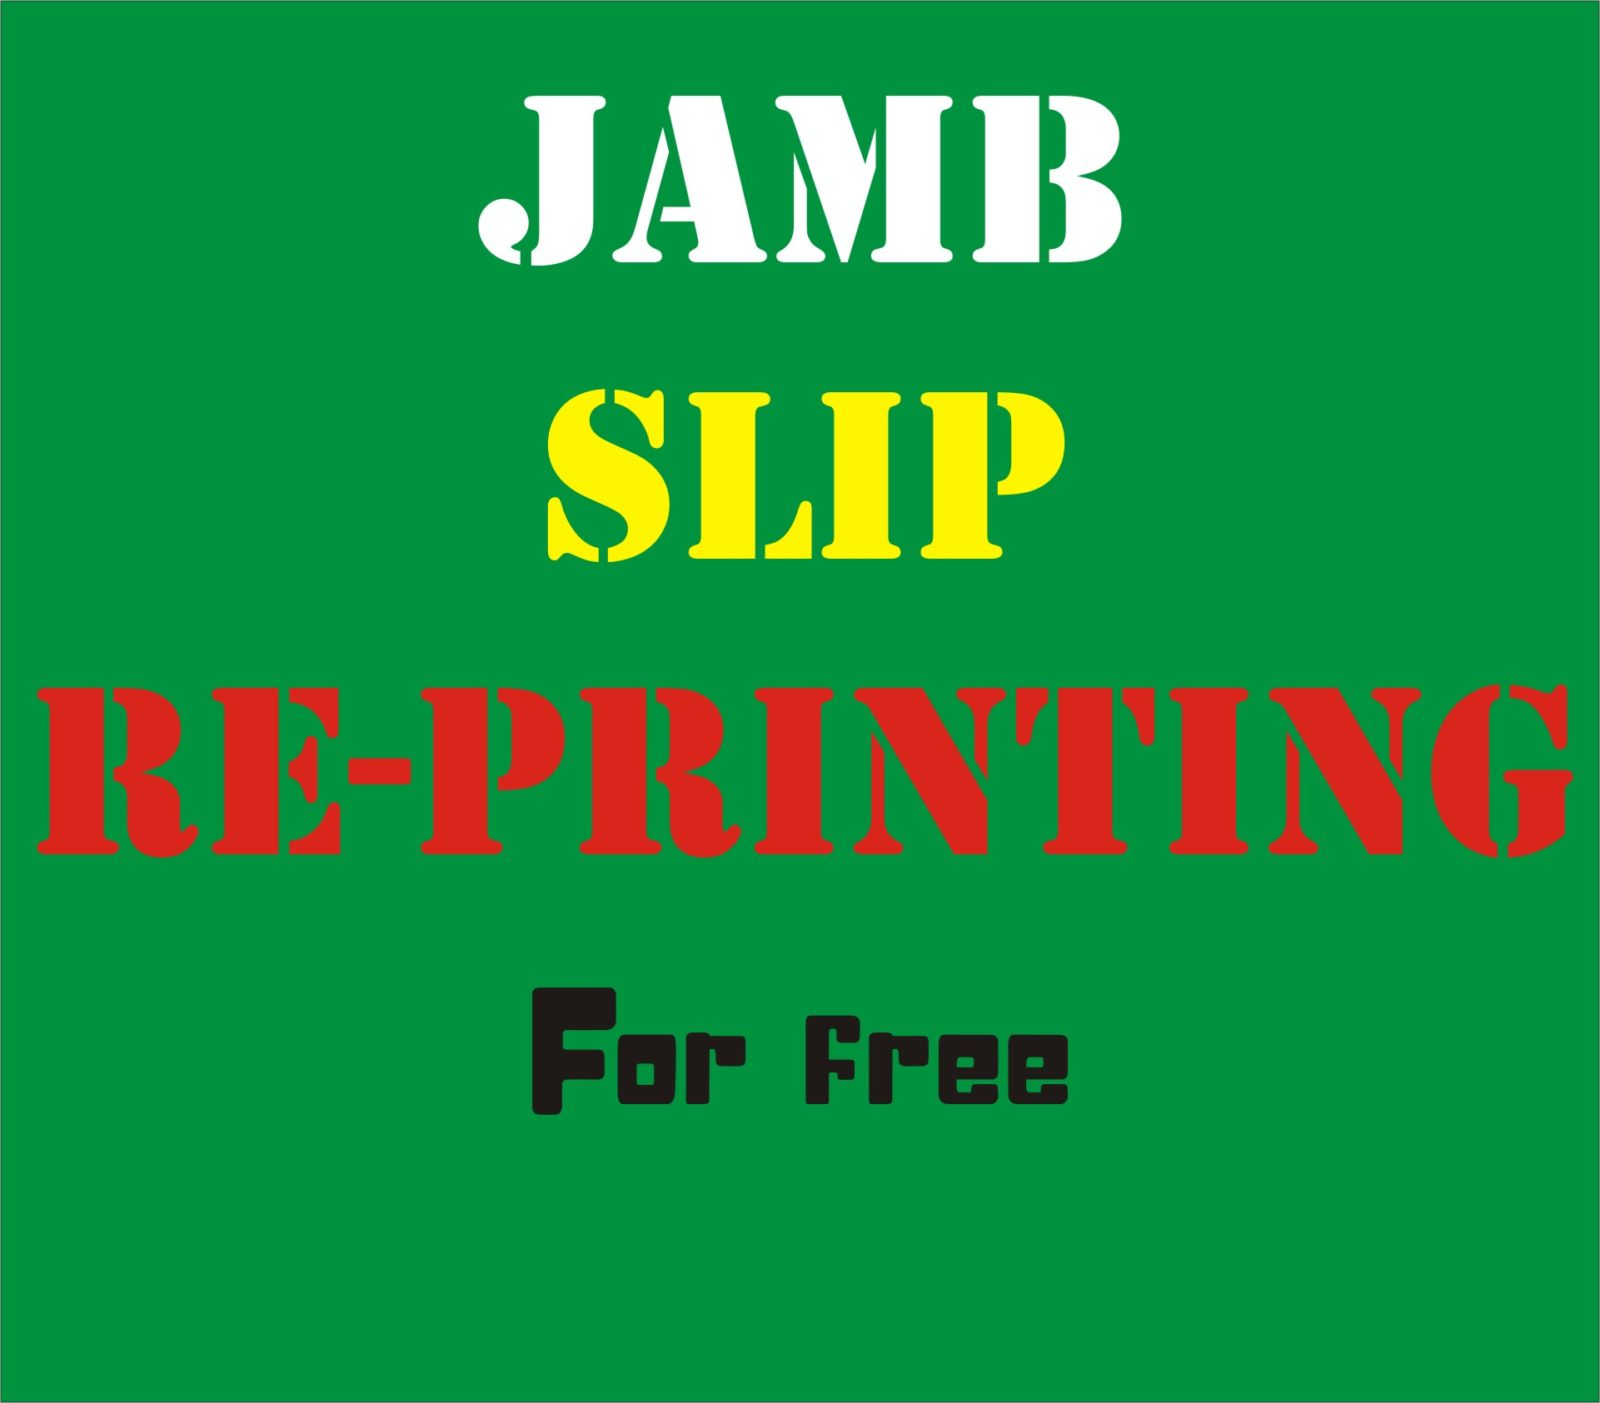 JAMB slip reprint